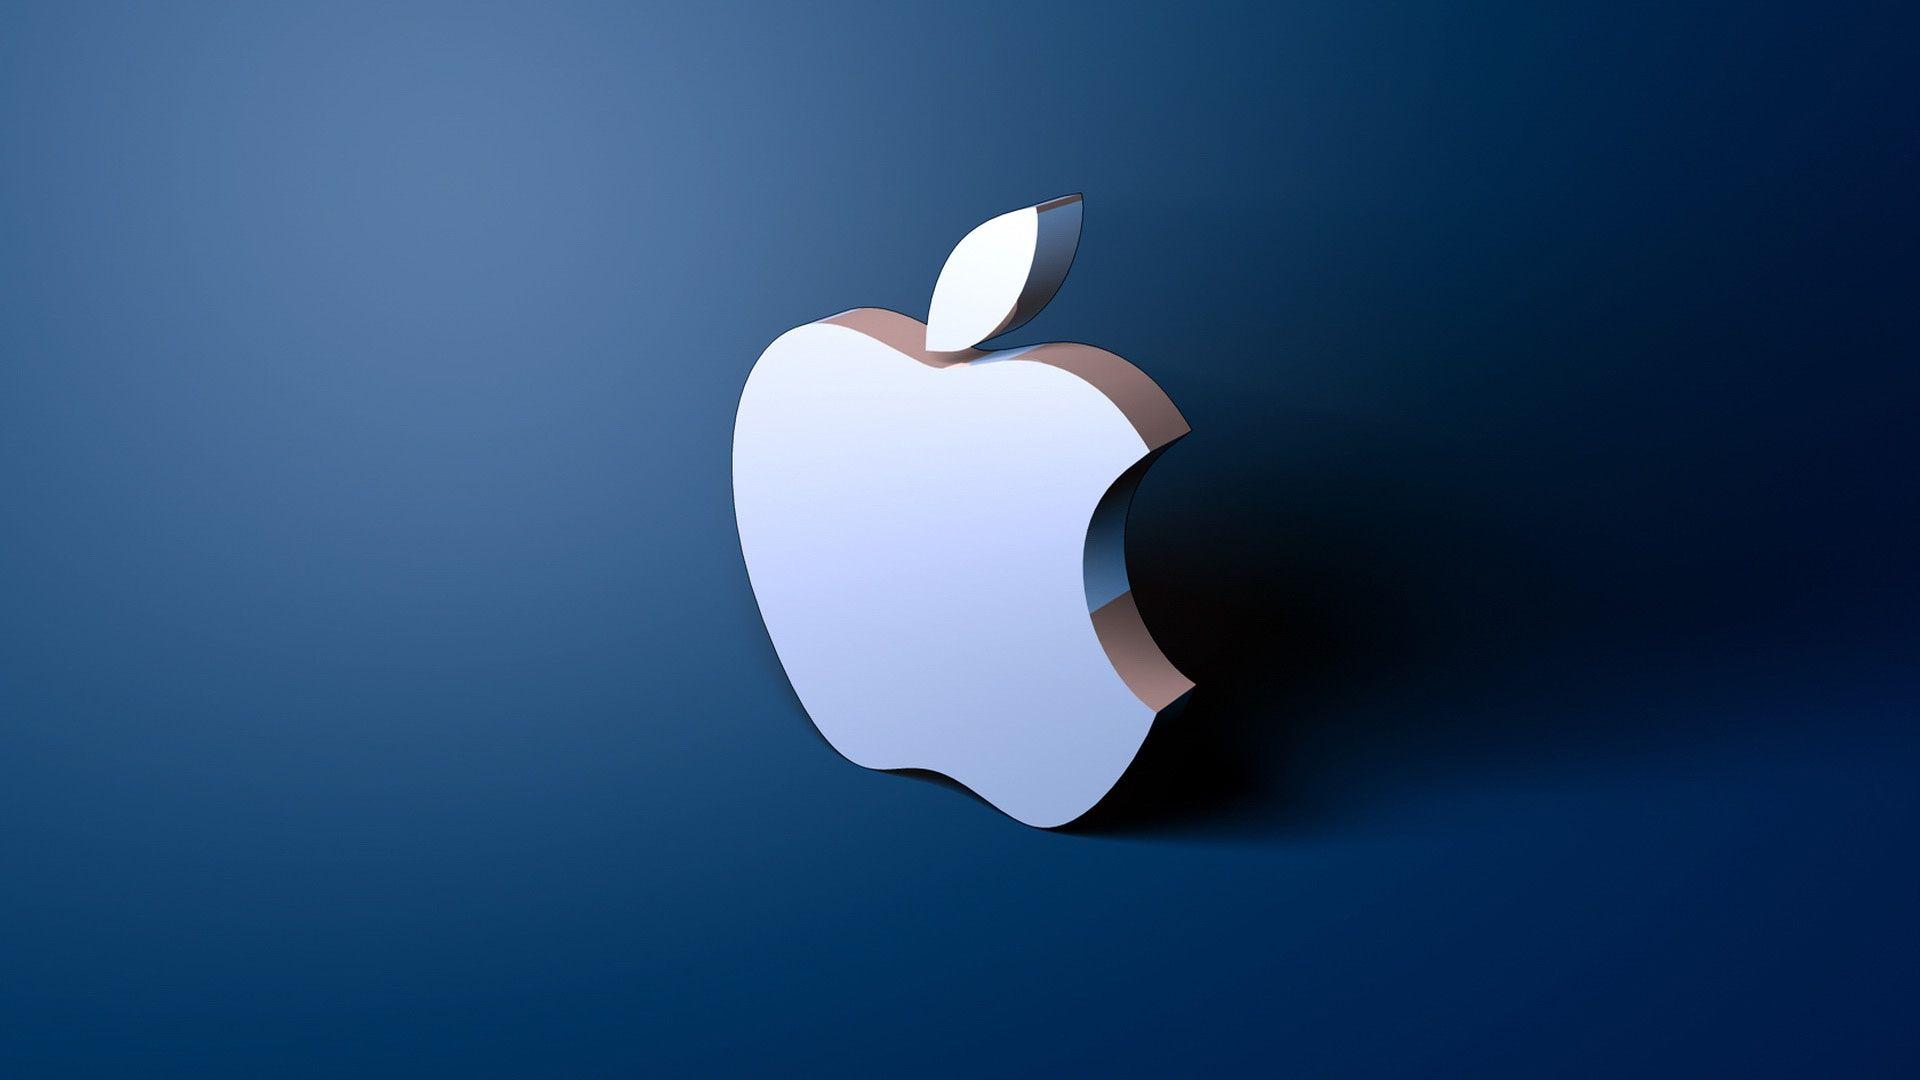 Full HD p Mac Wallpapers HD Desktop Backgrounds 19201200 Apple 1920x1080